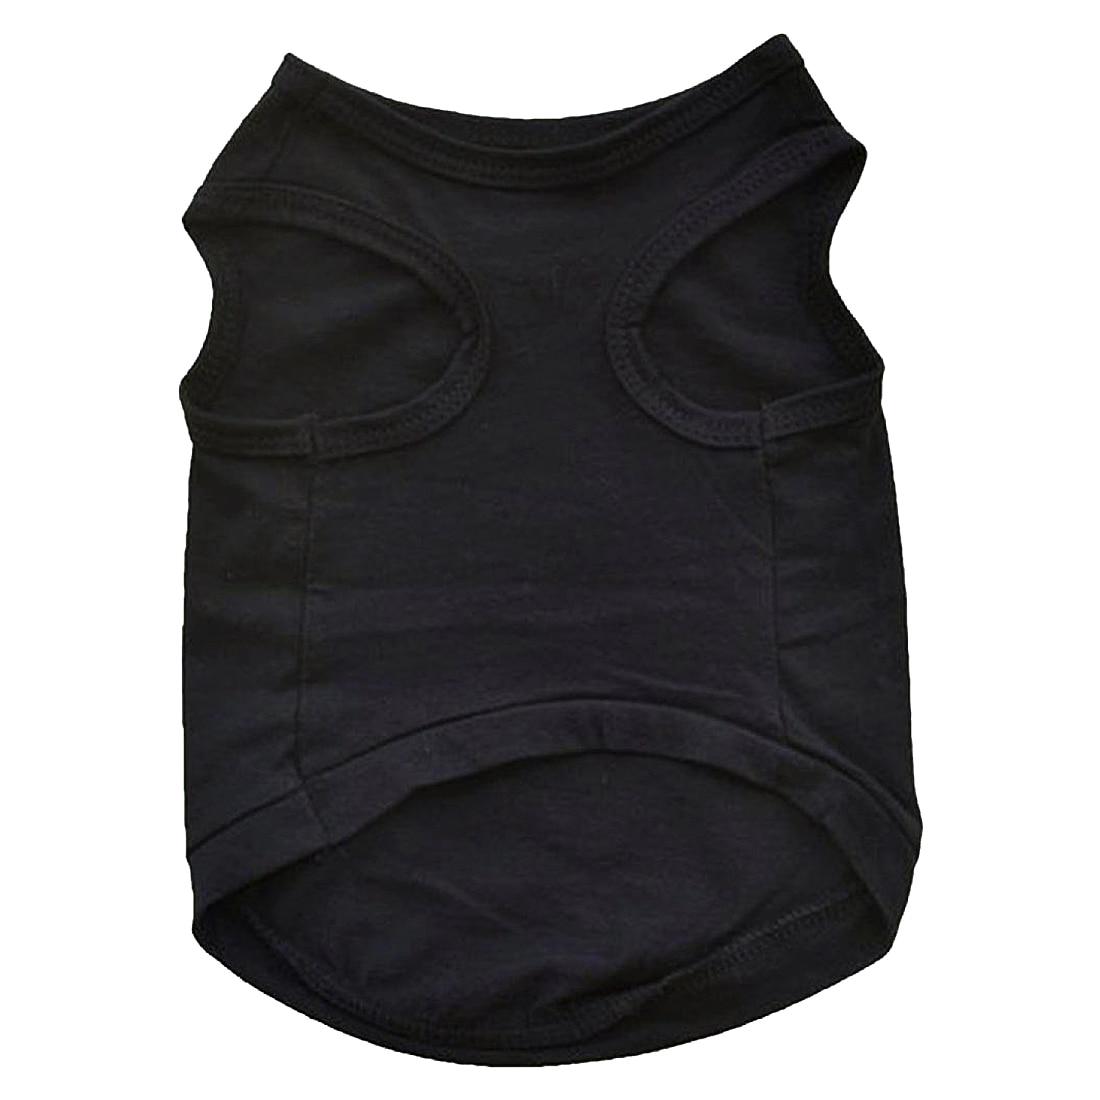 Pet Winter Clothes Puppy Dog Cat Vest T Shirt Coat Dress Sweater Apparel SECURITY, Black